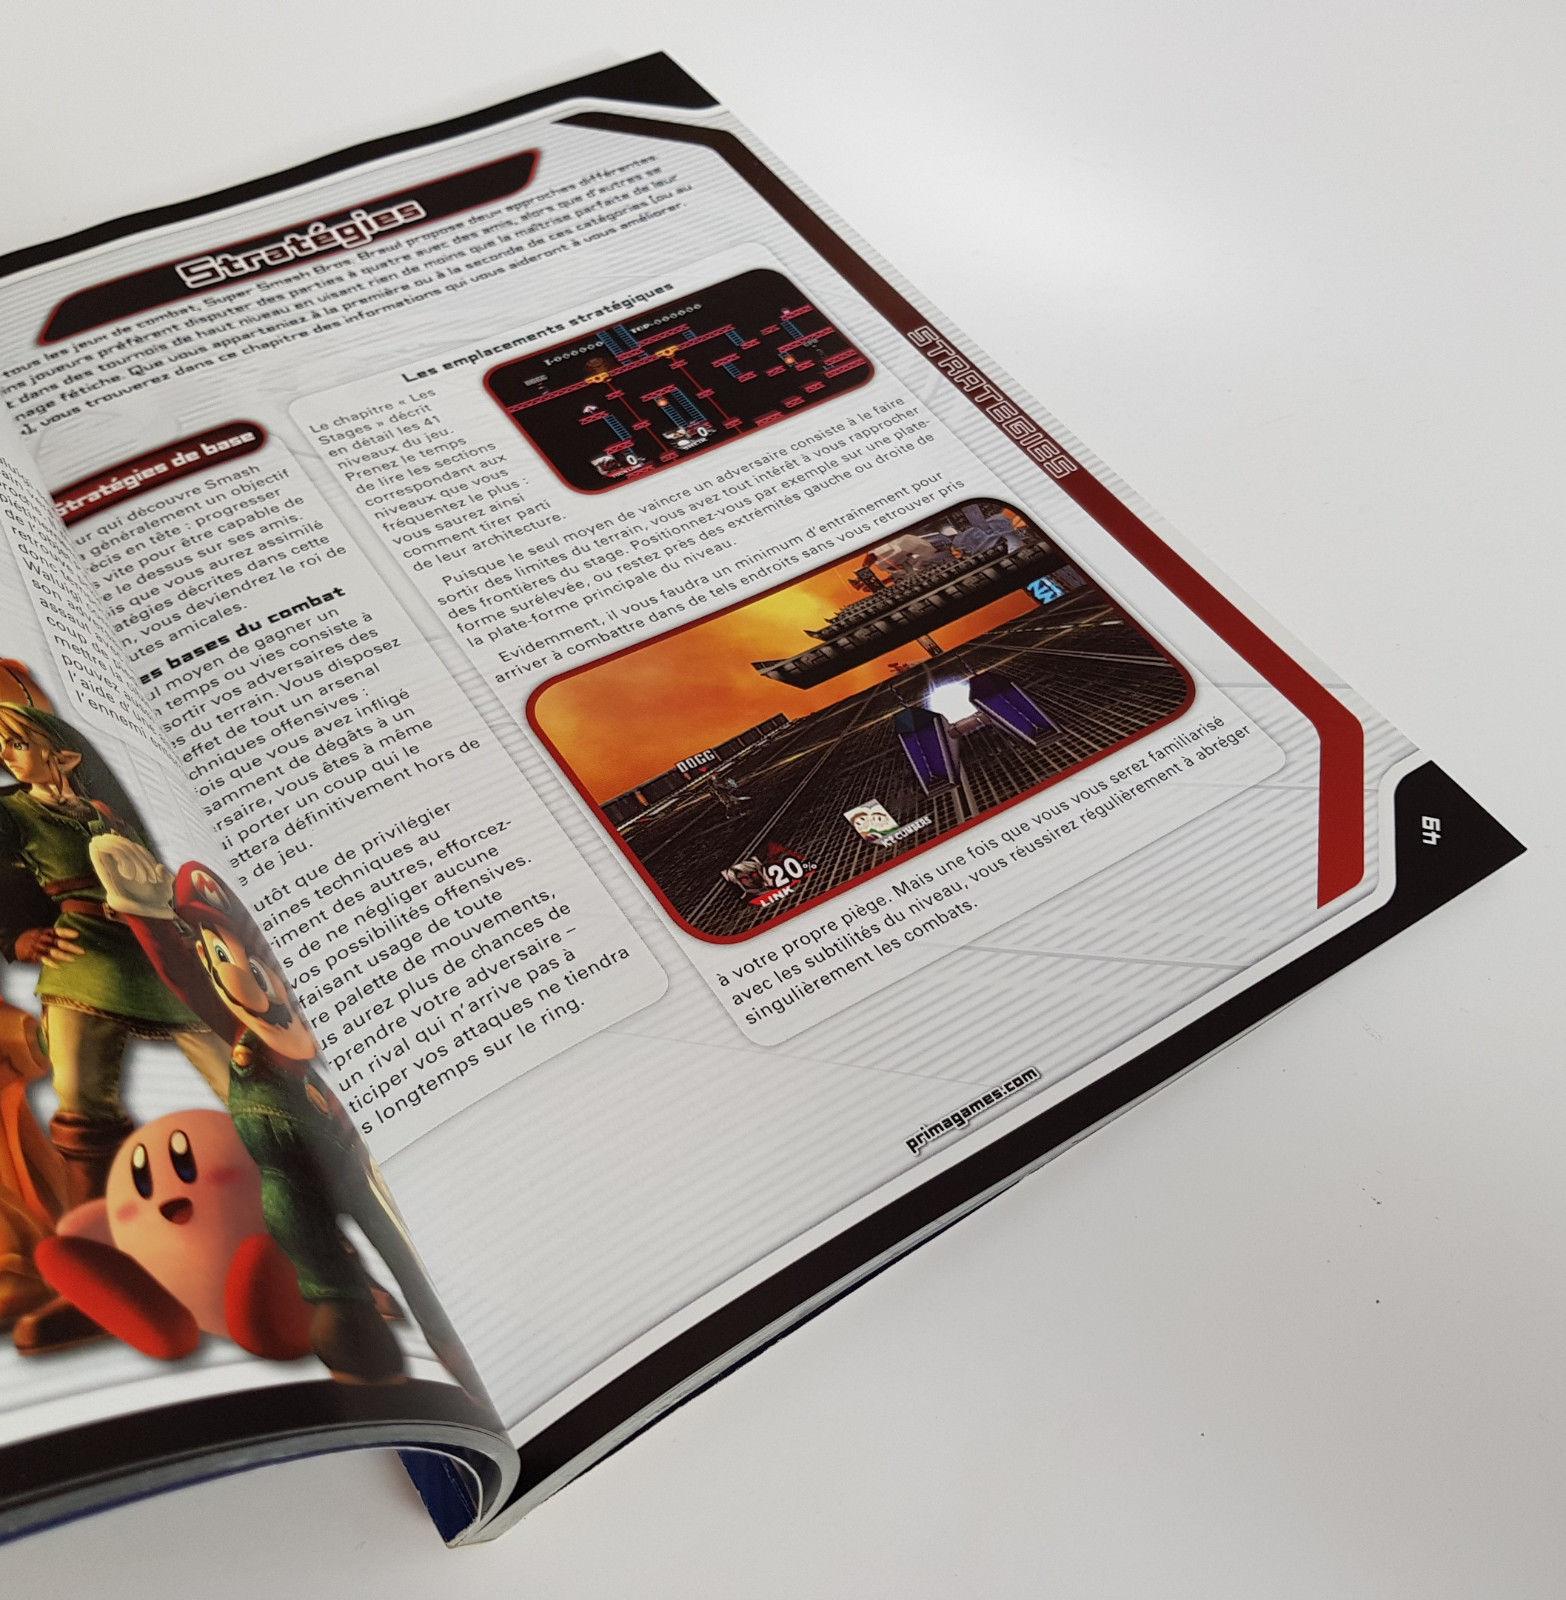 guide officiel Super Smash Bros. Brawl